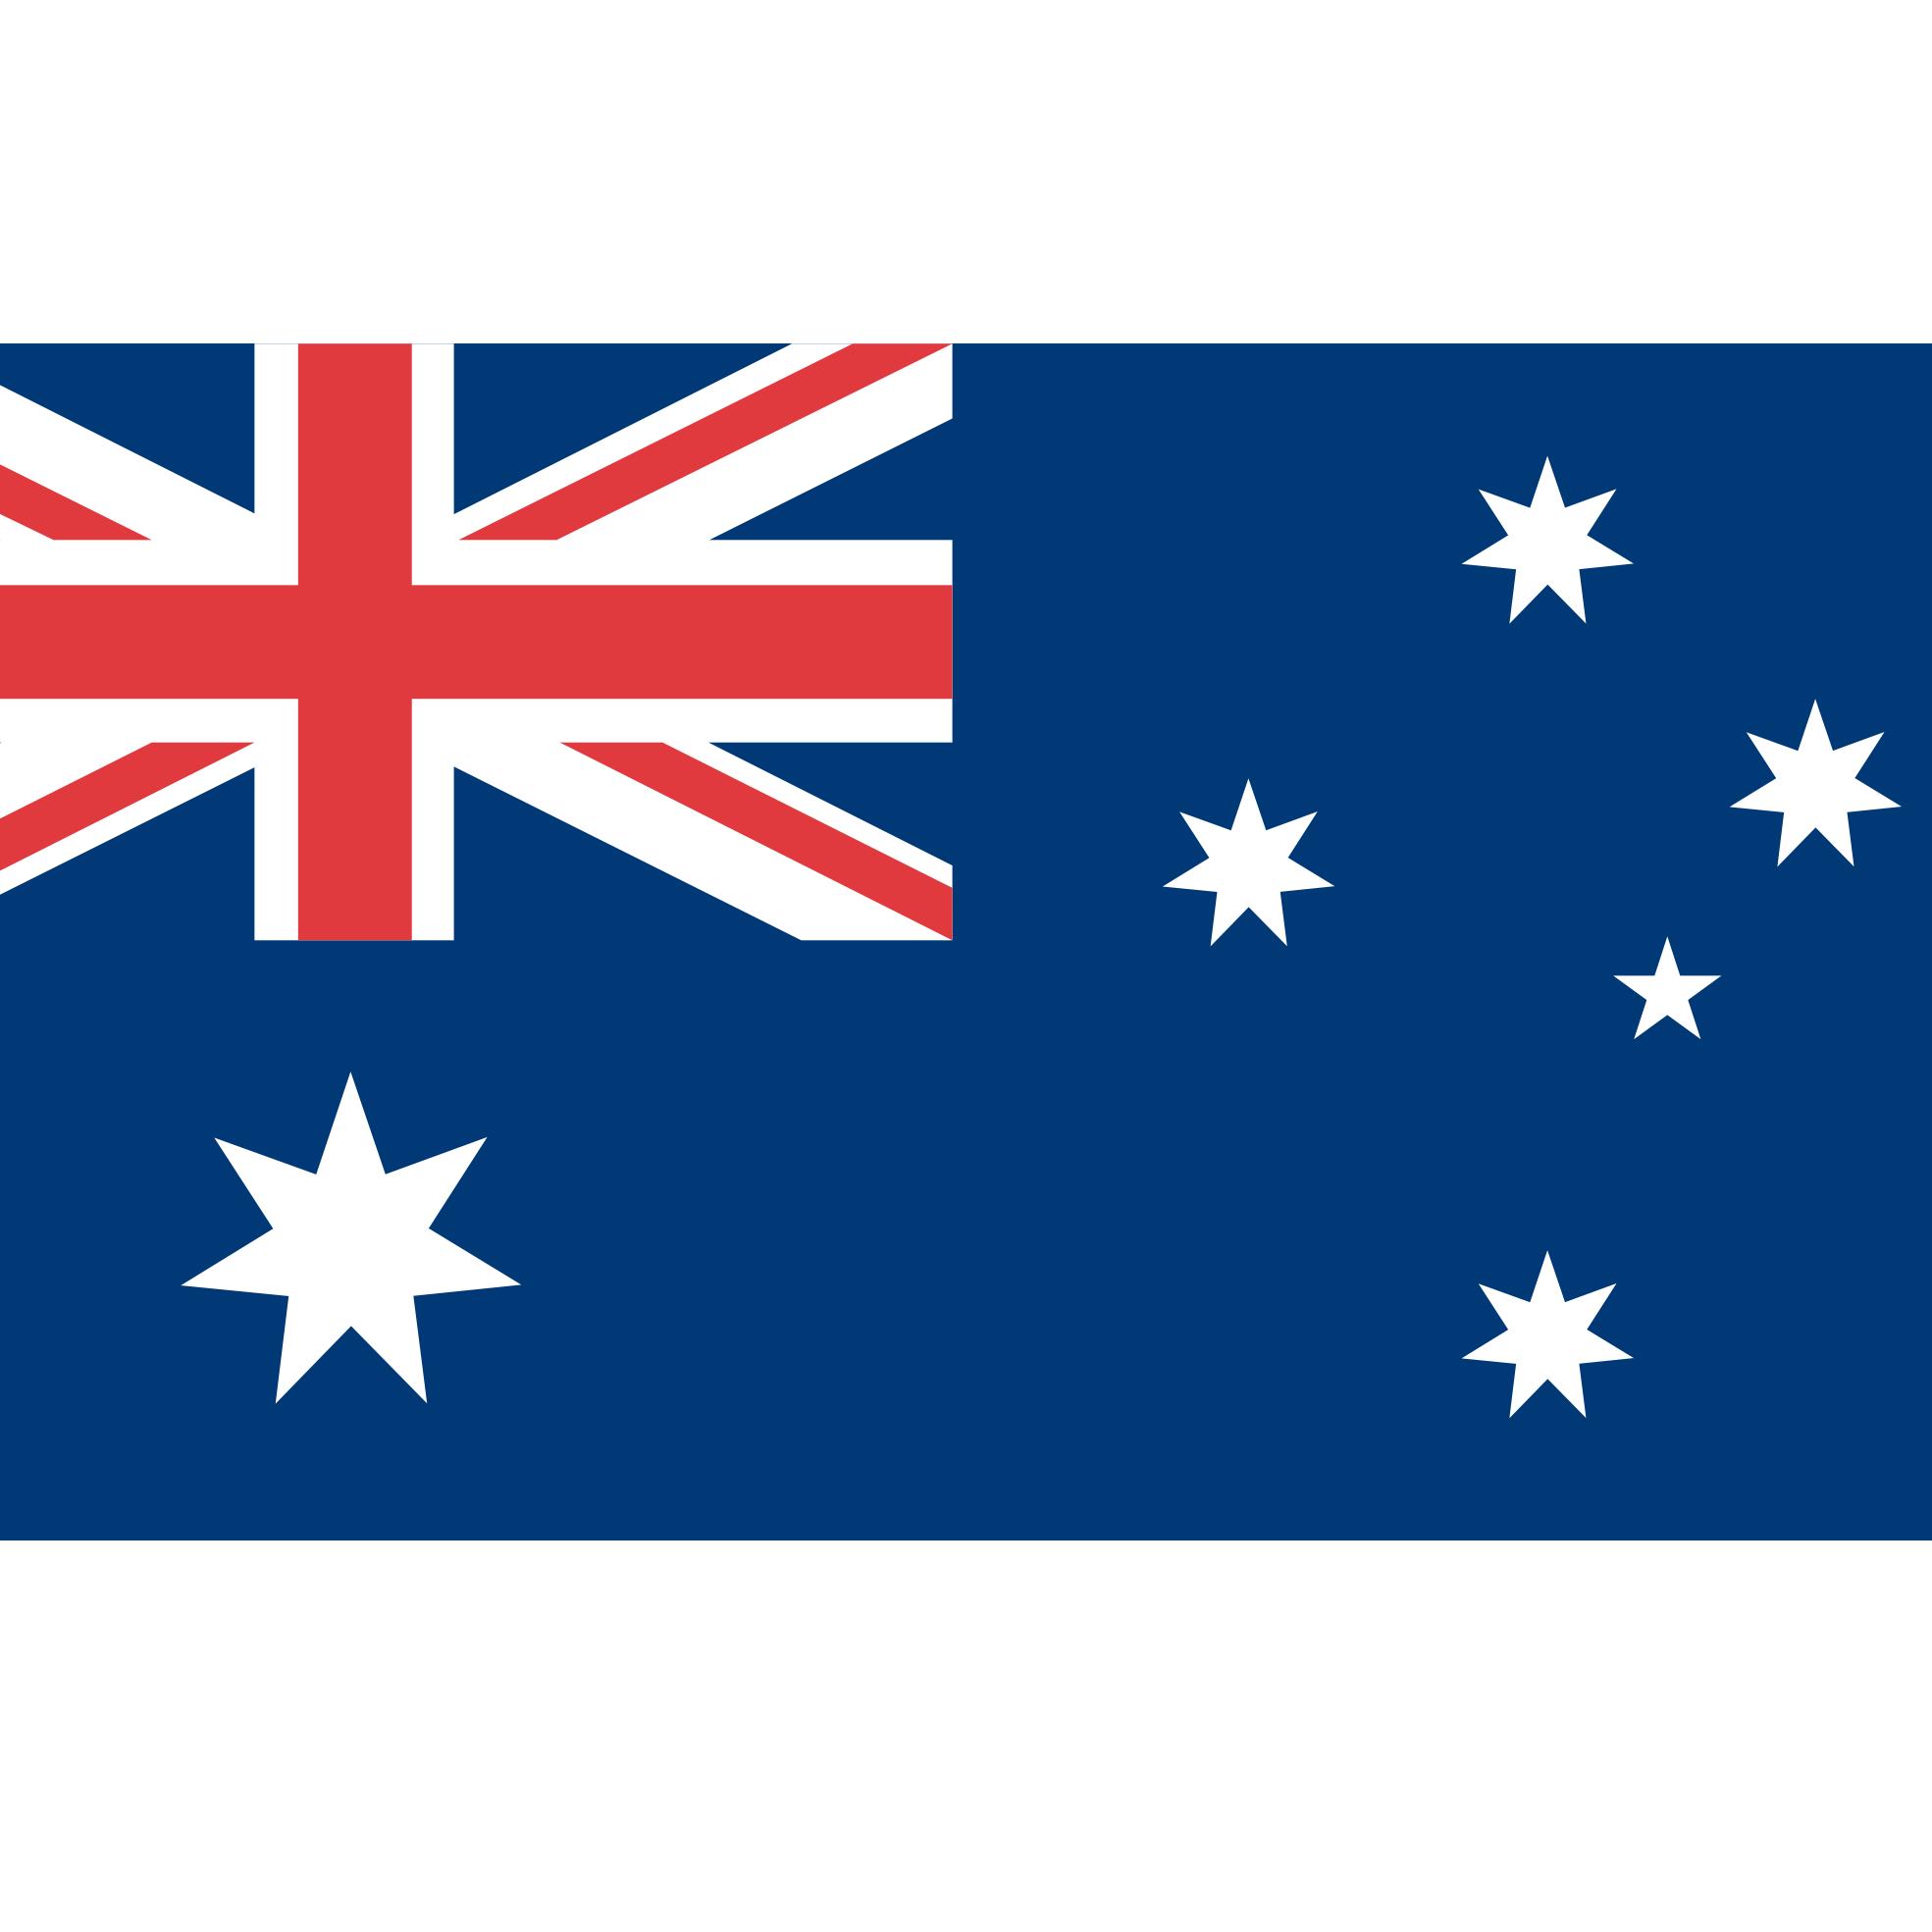 Australia flag clipart clip art free stock Australian flag clipart - ClipartBarn clip art free stock